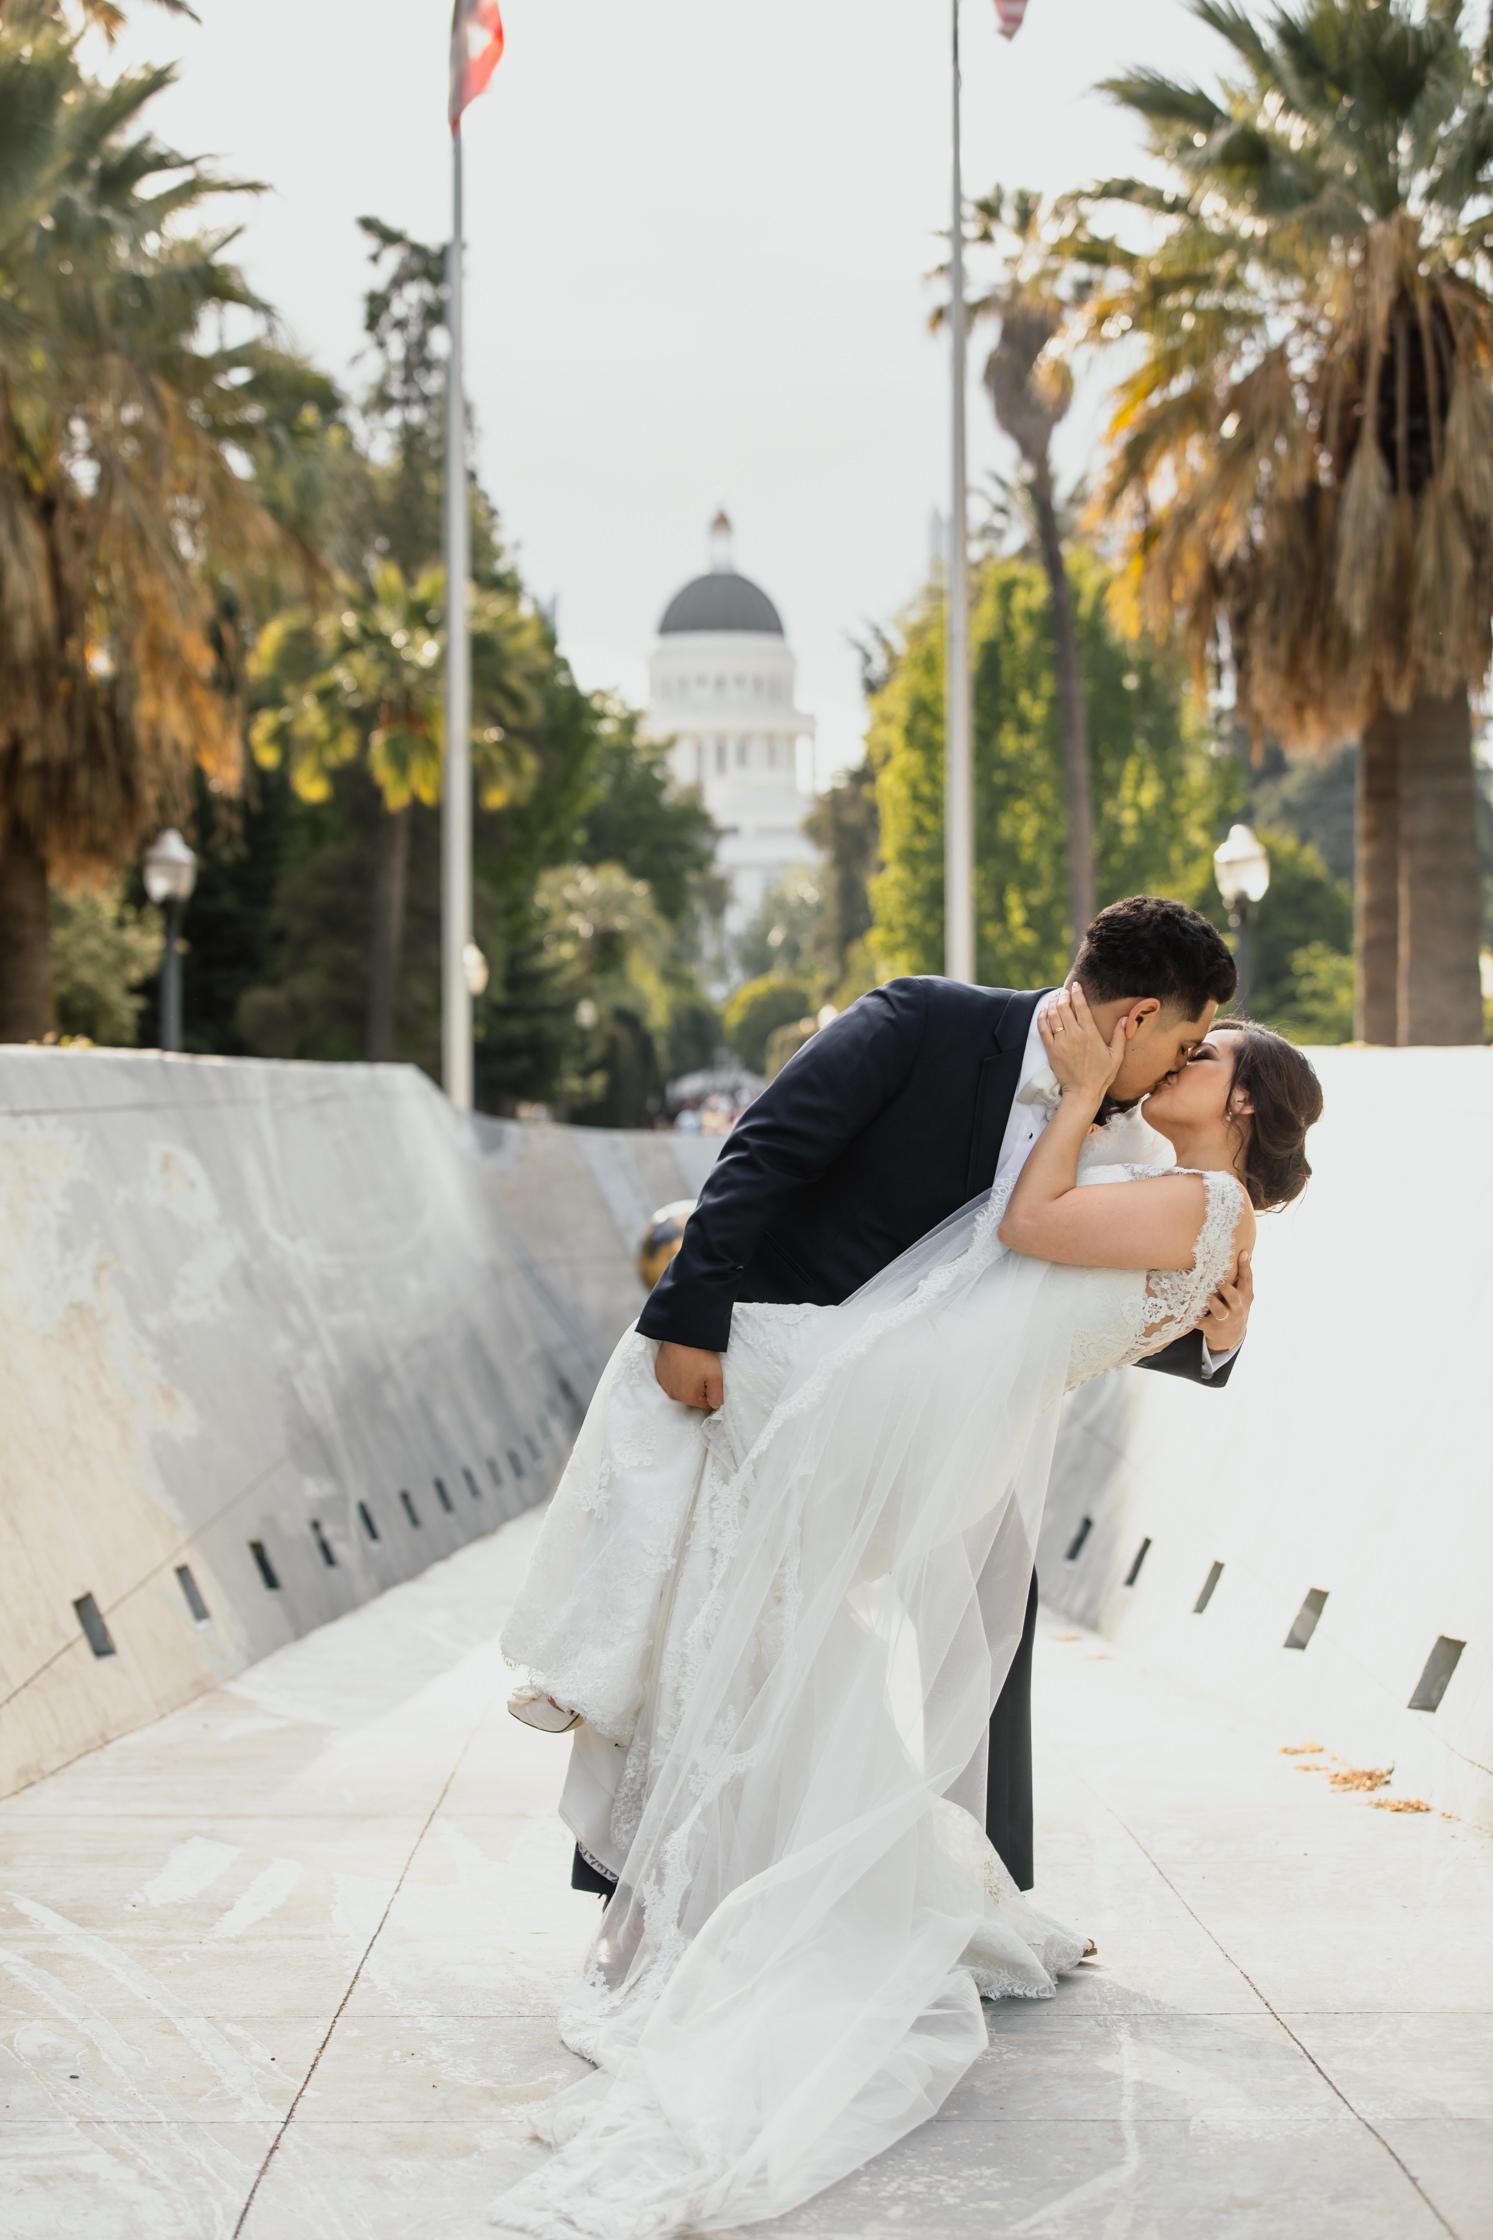 luis_joanna_wedding-65.jpg